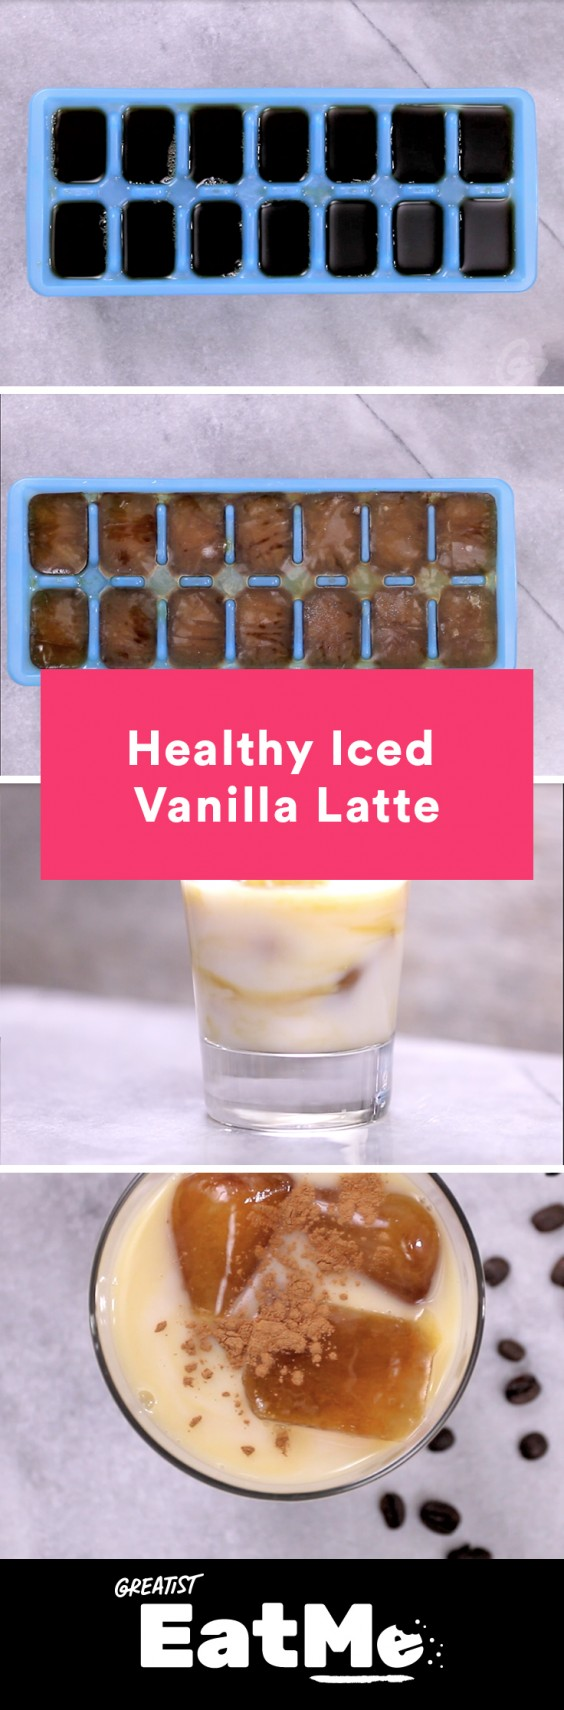 Eat Me Video: Healthy Vanilla Latte